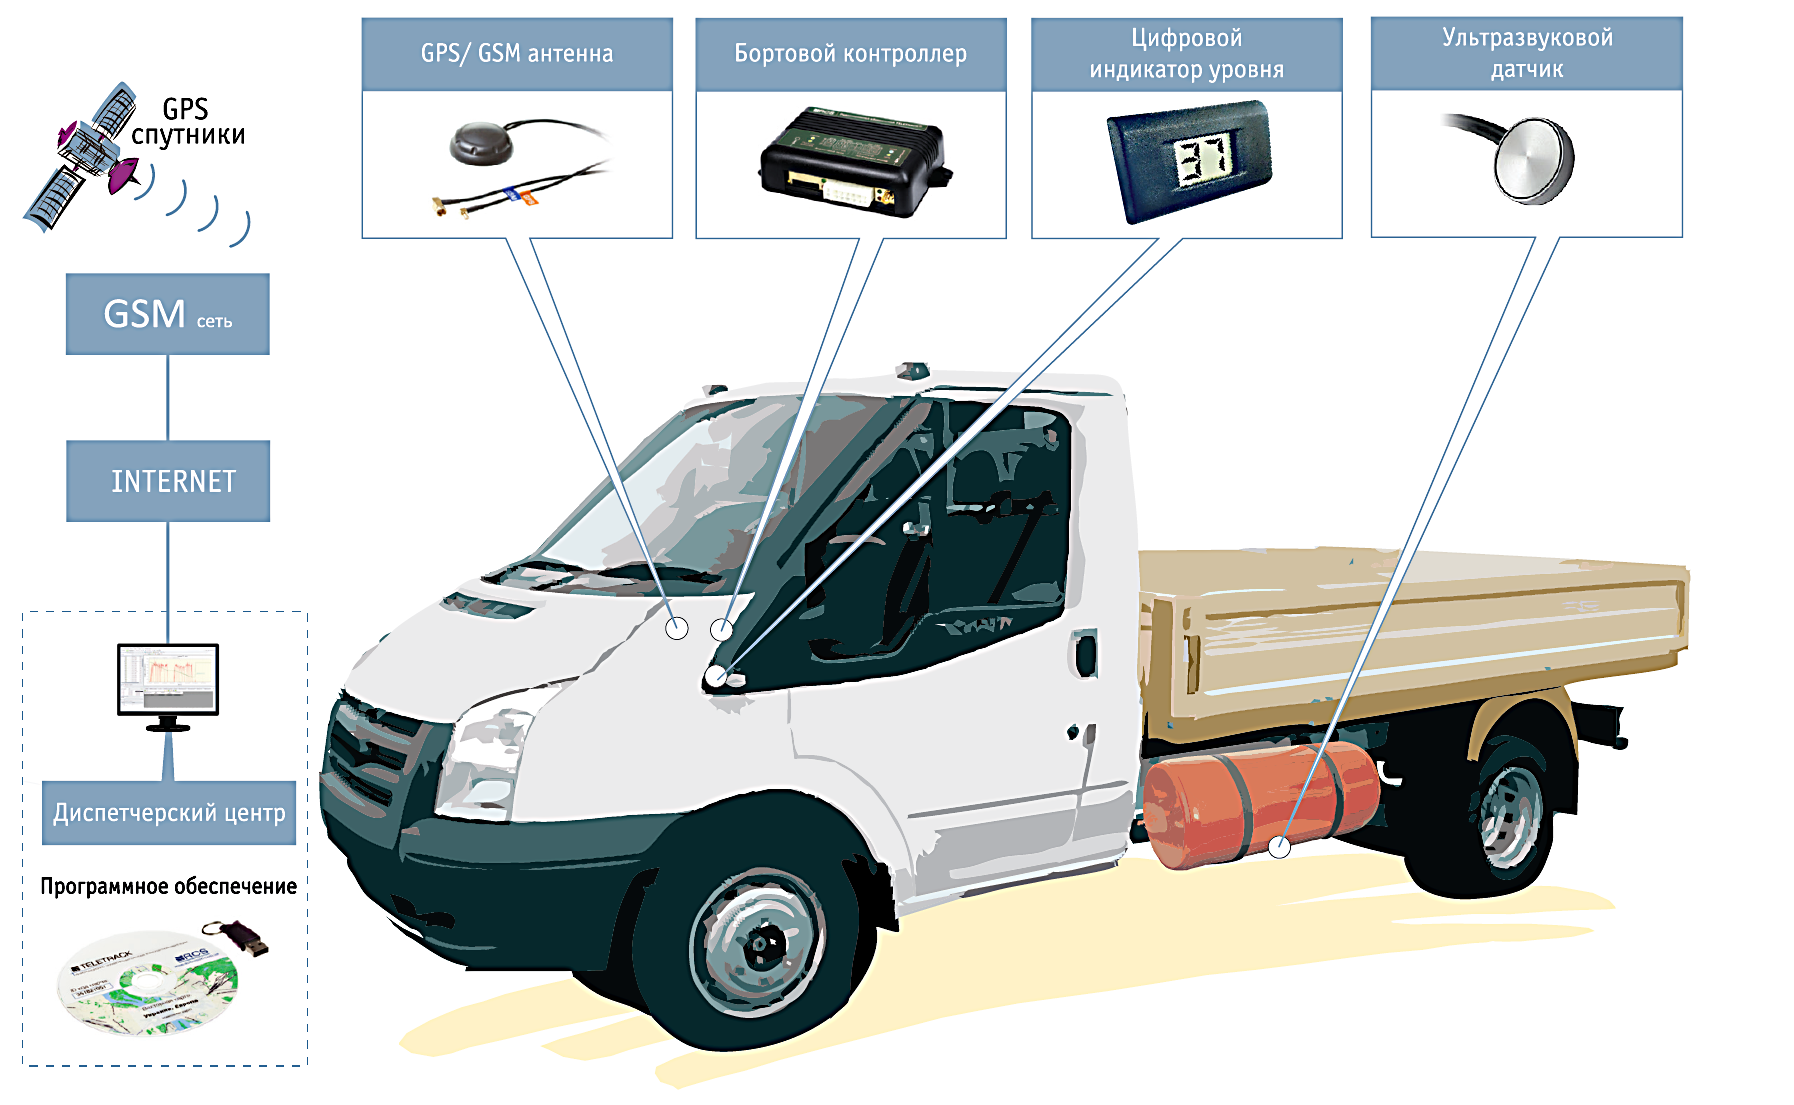 Мониторинг и контроль уровня топлива на системах ГБО для предприятий